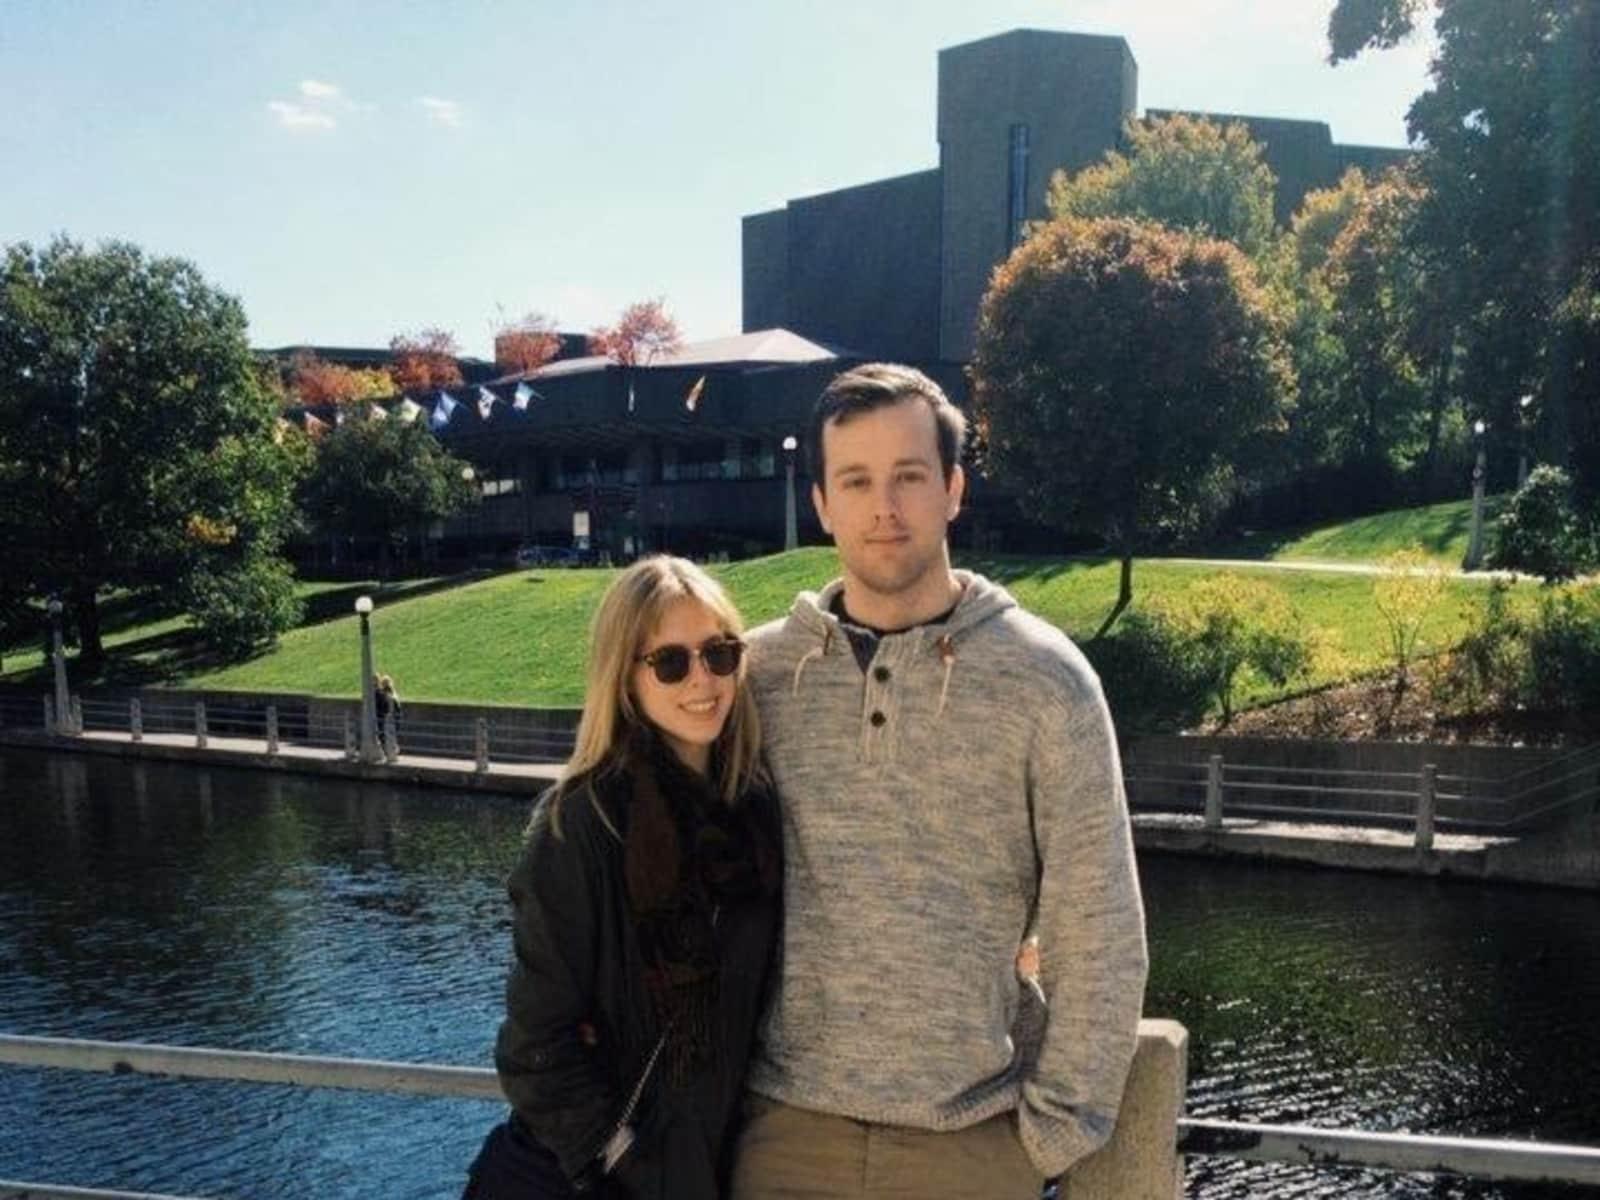 Marc & Danielle from Ottawa, Ontario, Canada